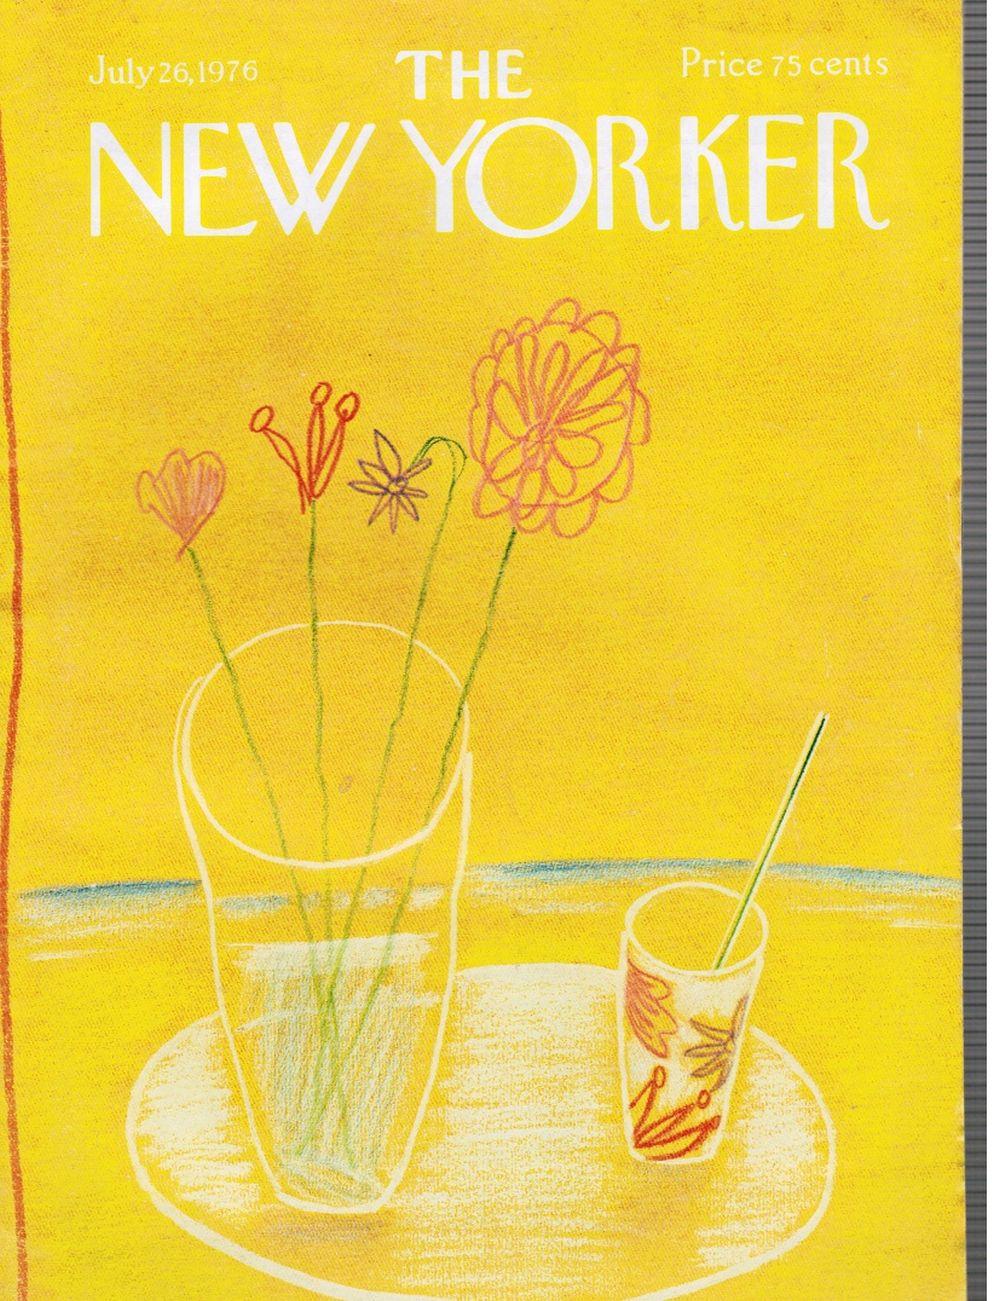 The New Yorker Magazine: July 26, 1976 Handguns, William Steig, carlos drummond de andrade